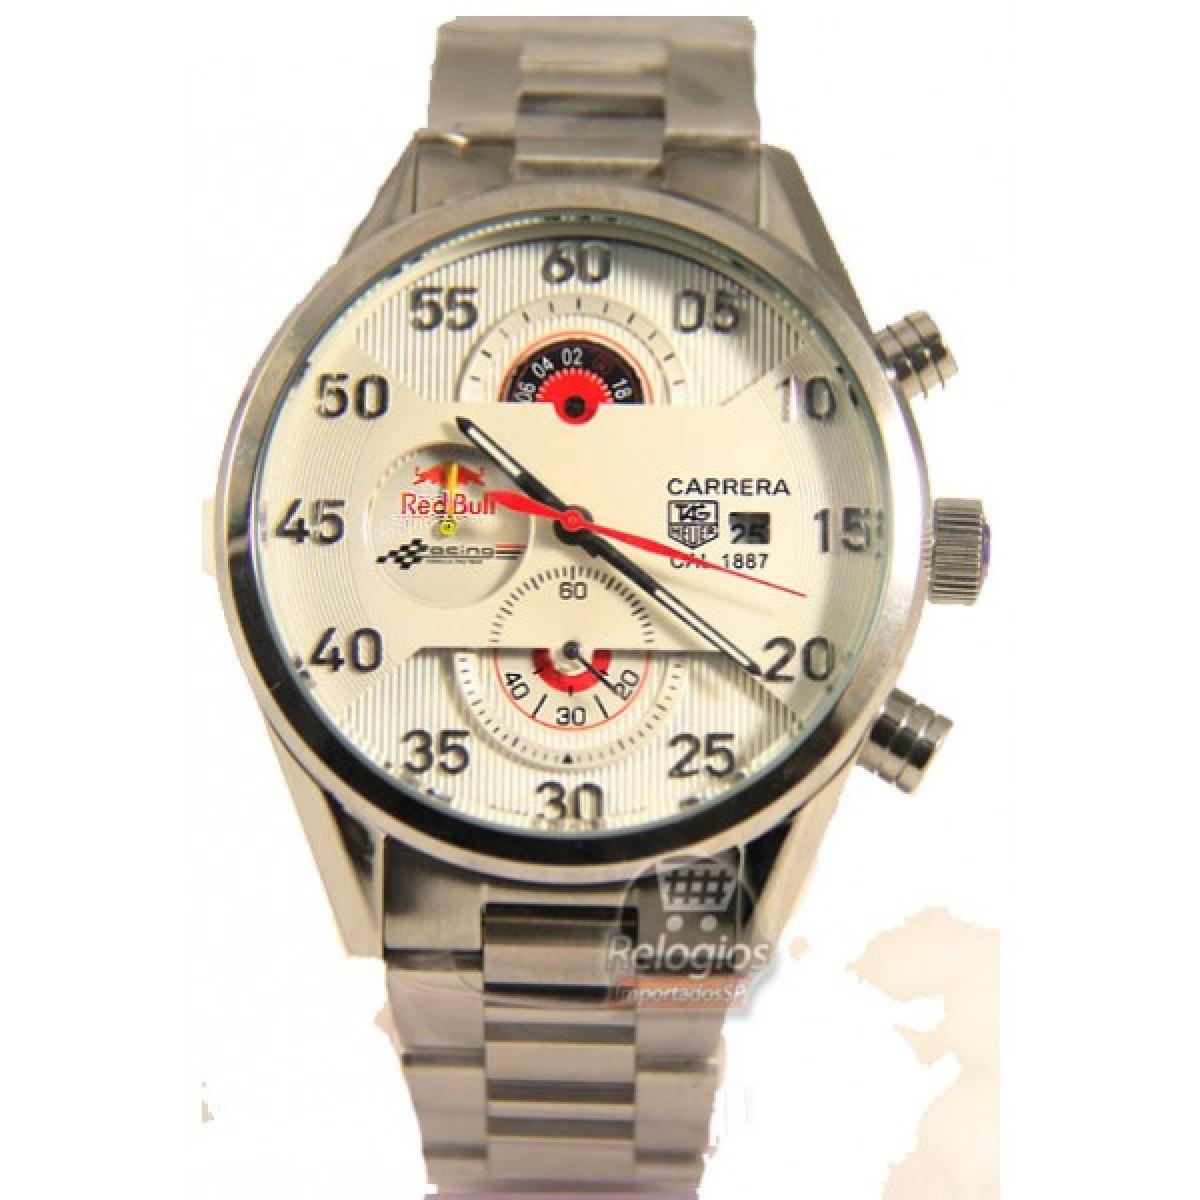 4bdf5b81556 Espiar · Relógio Réplica Tag Heuer Red Bull